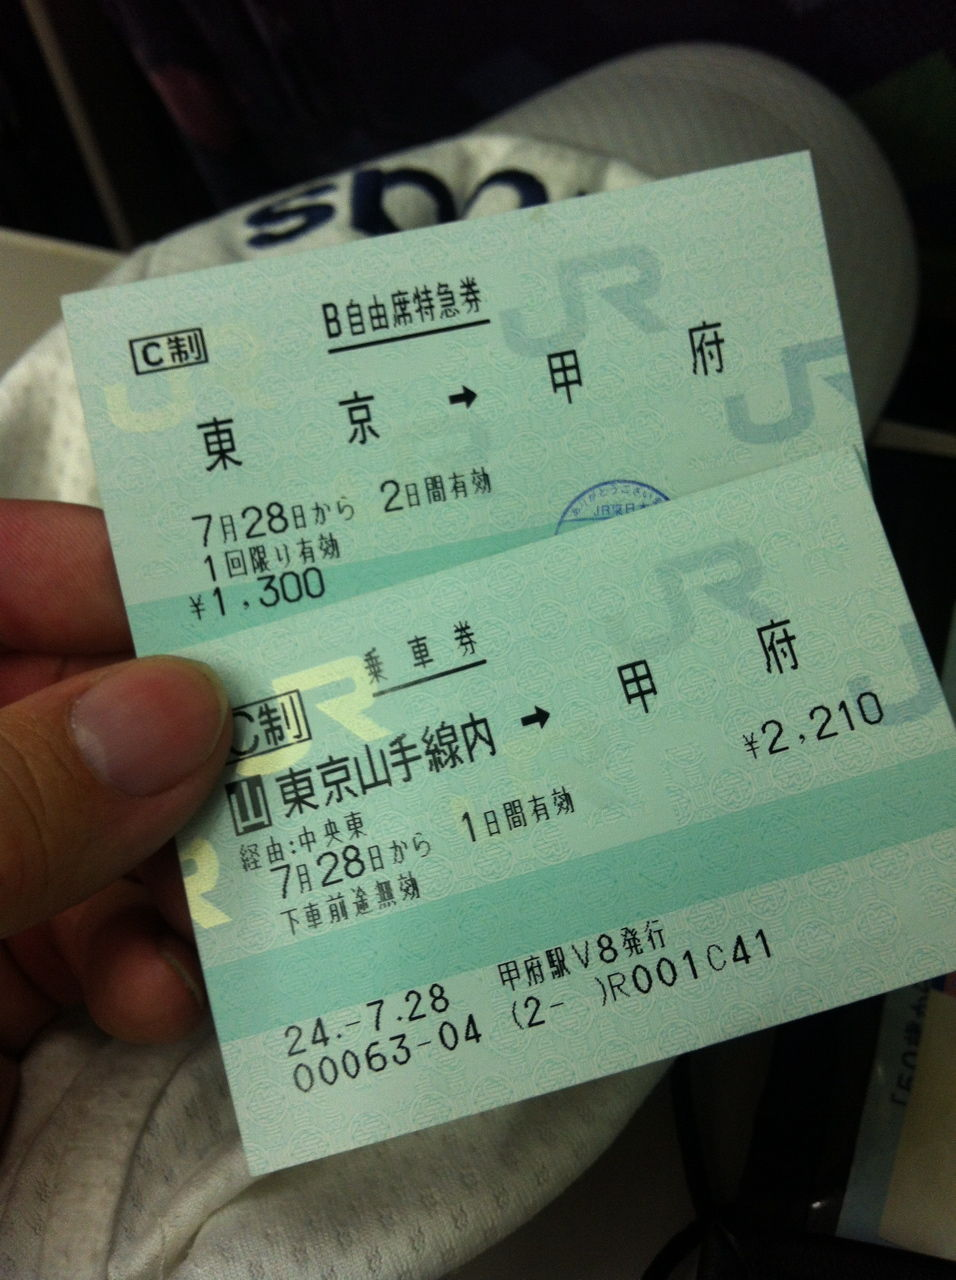 特急甲斐路の乗車券類